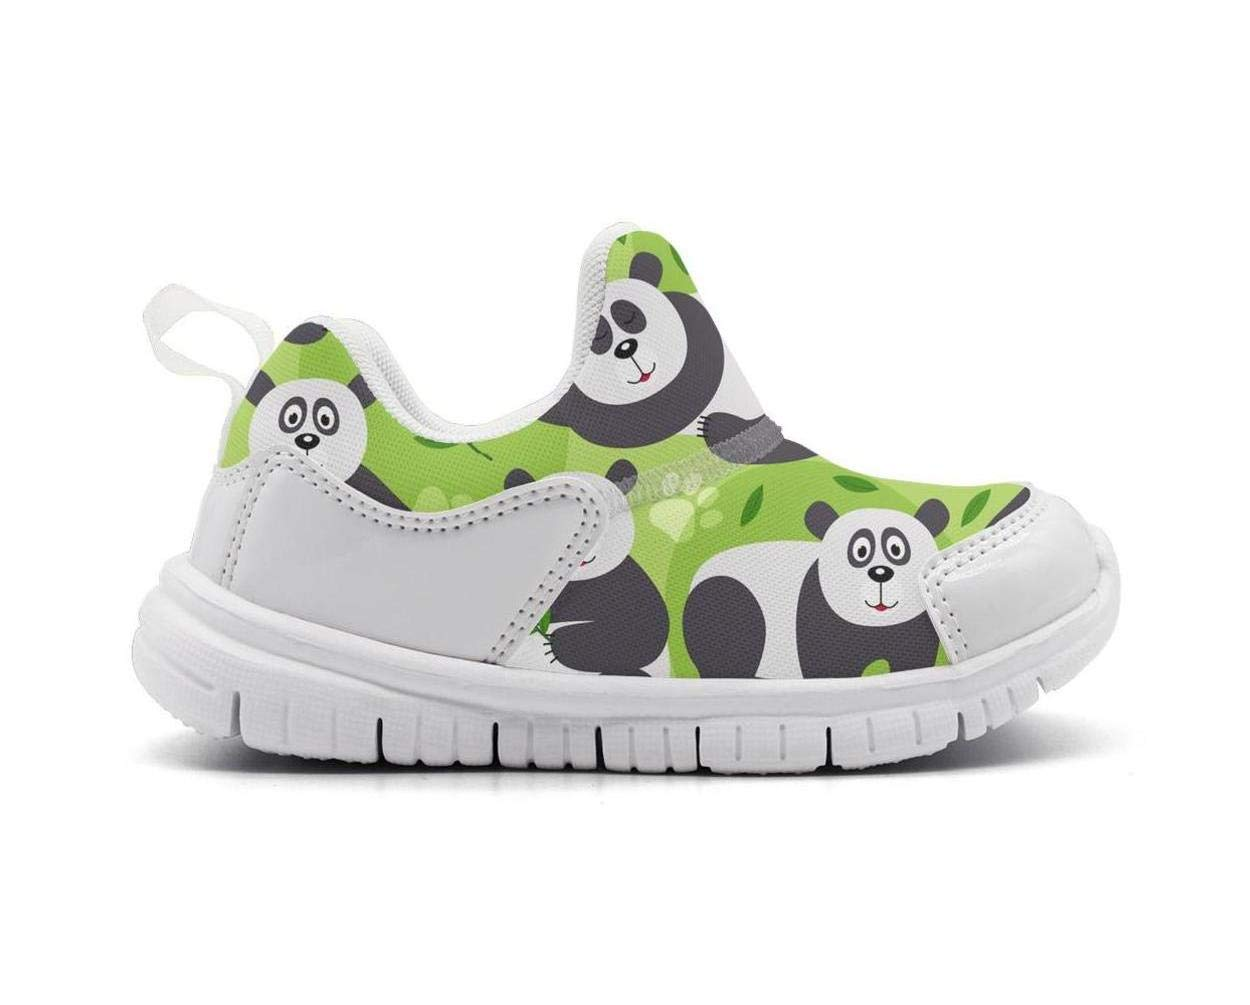 ONEYUAN Children Green Bamboo Panda Bear Kid Casual Lightweight Sport Shoes Sneakers Running Shoes